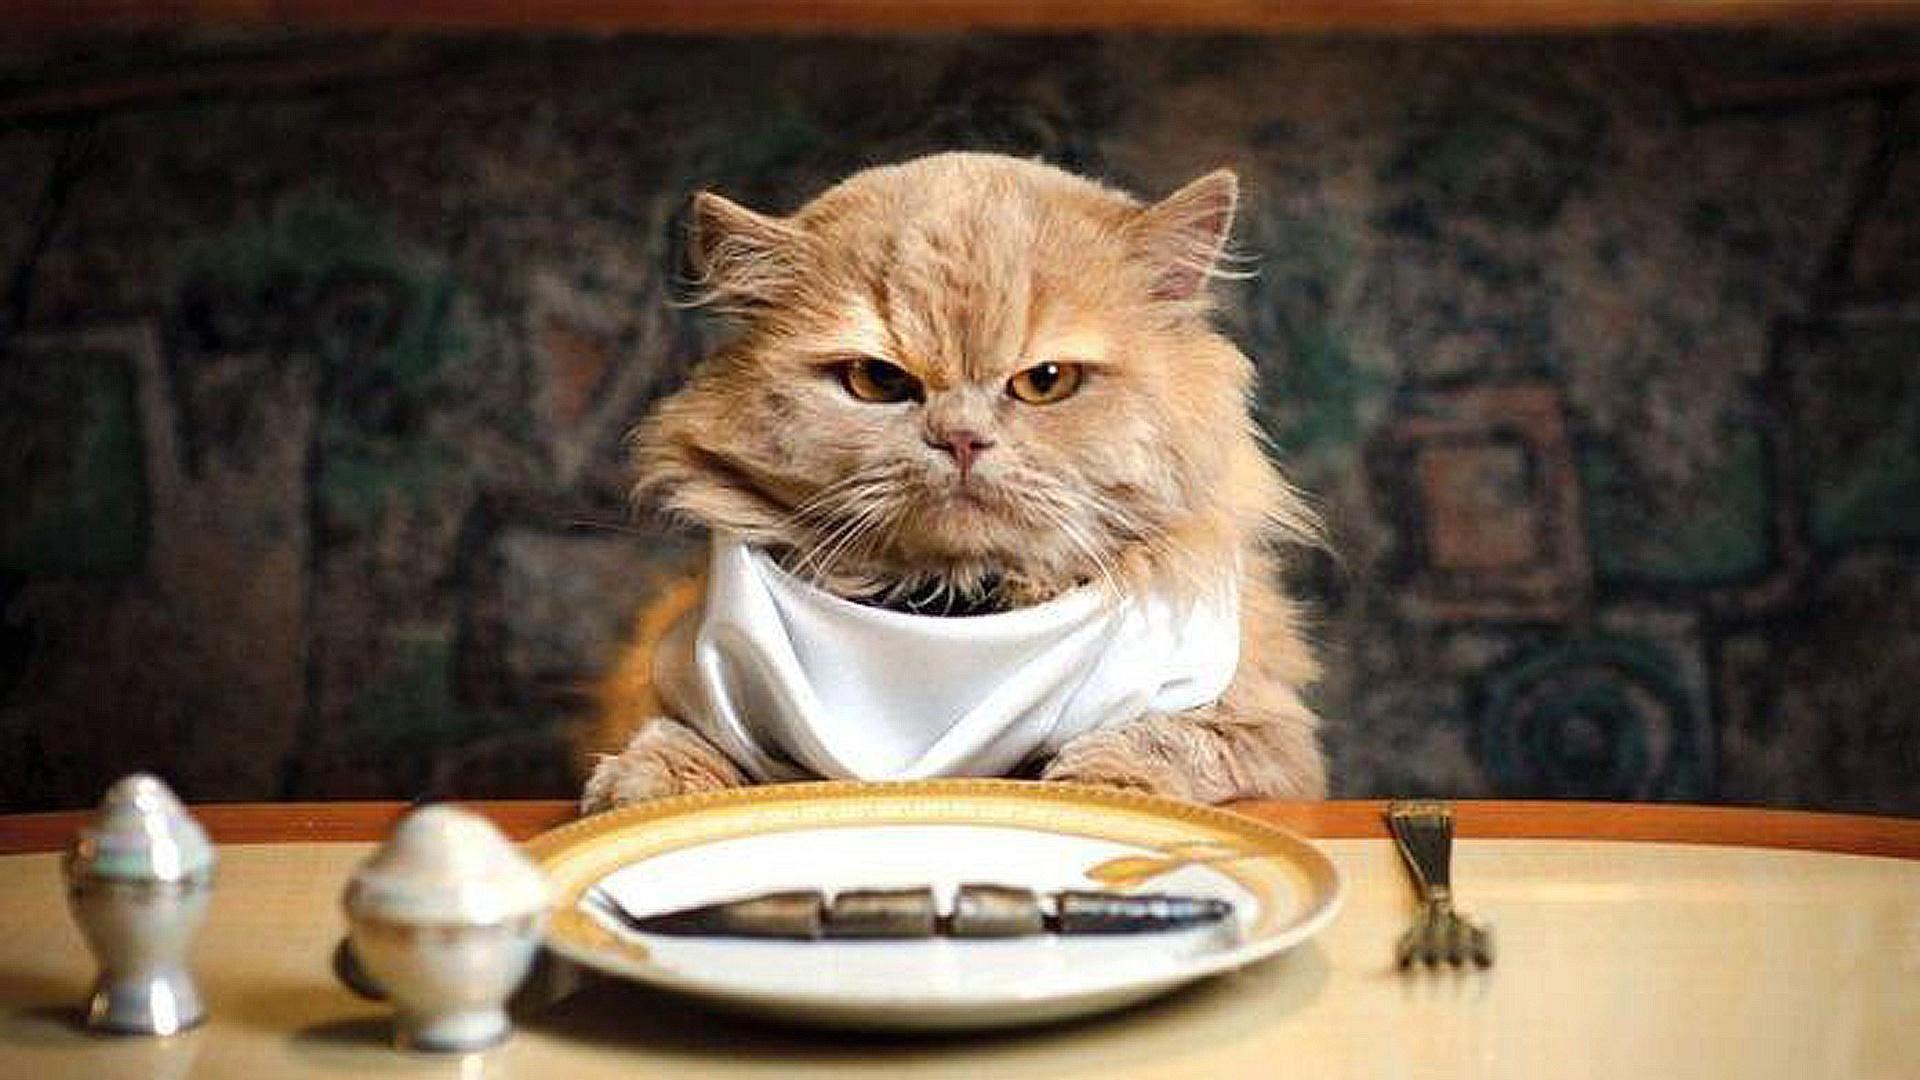 Eating cat photo